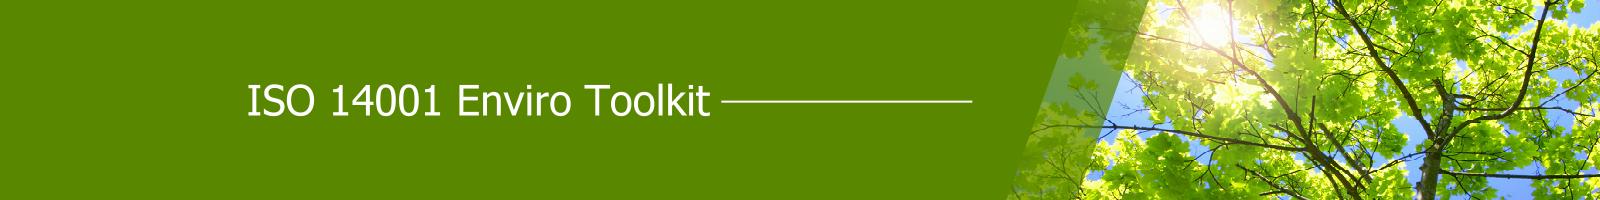 ISO 14001 Enviro Toolkit banner